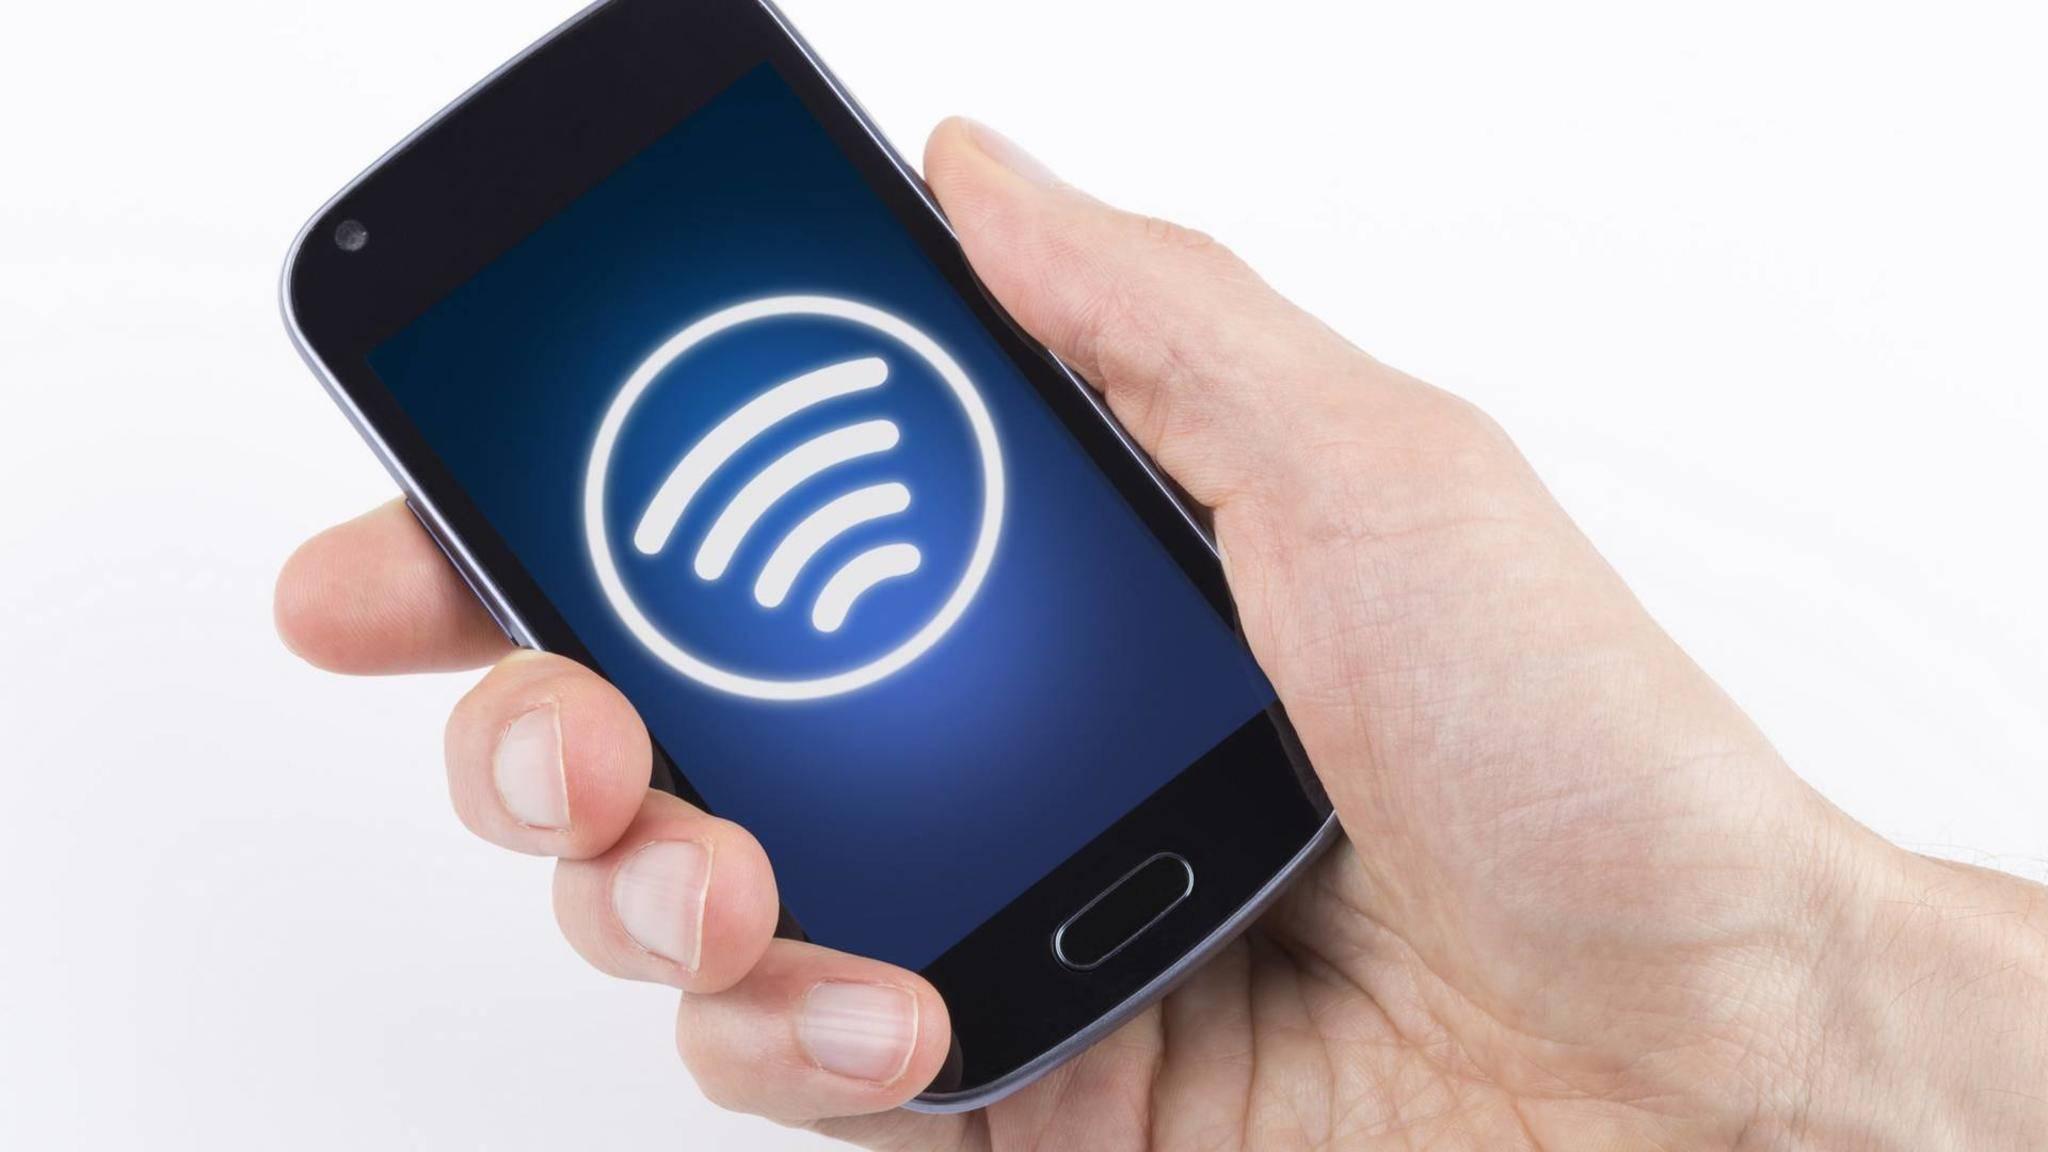 Die NFC-Schnittstellen bei Android-Smartphones haben mehrere Funktionen.